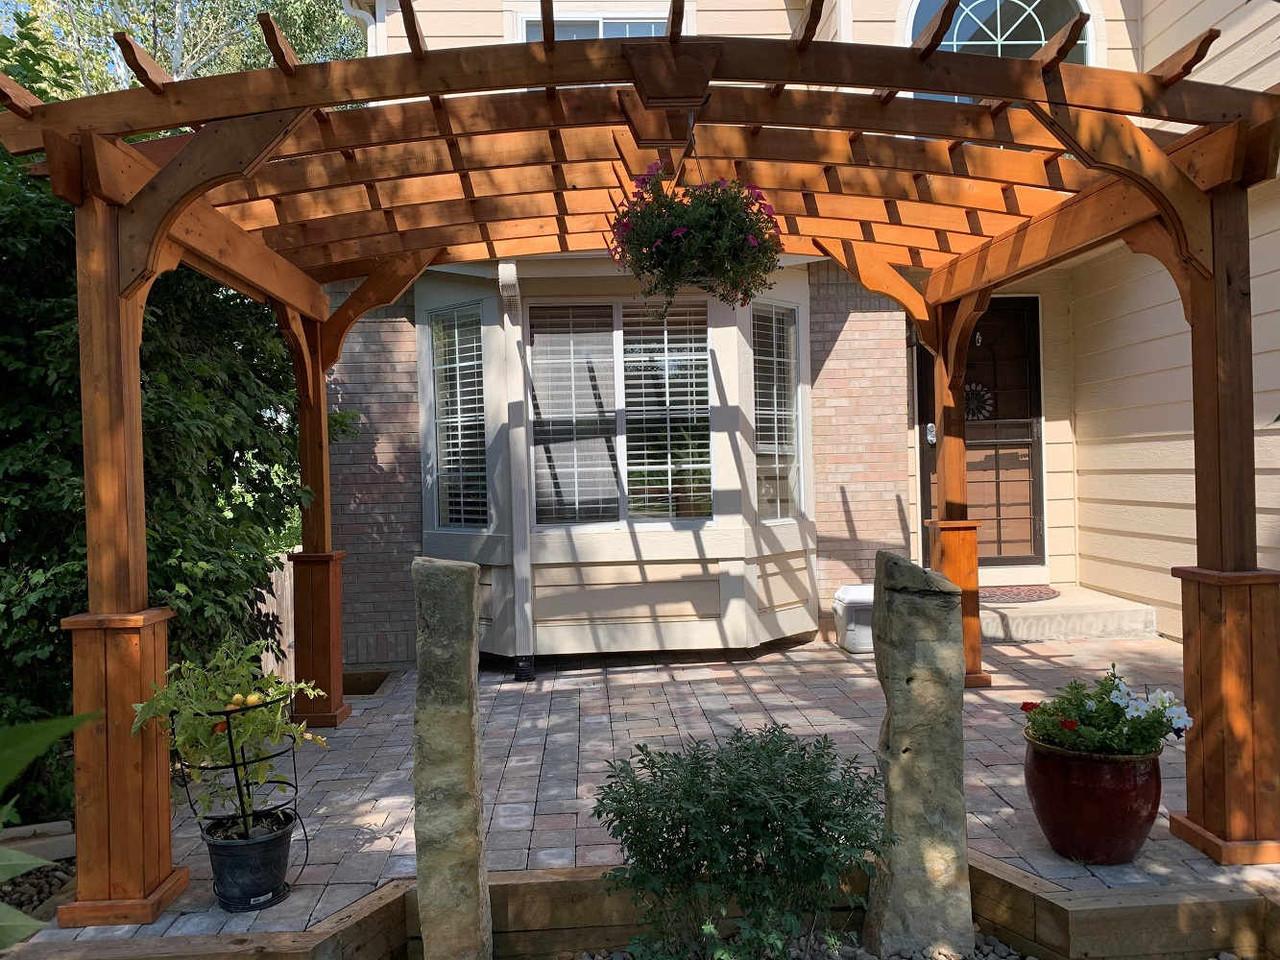 8x12 Arched Cedar Pergola Kit, Thornton, CO